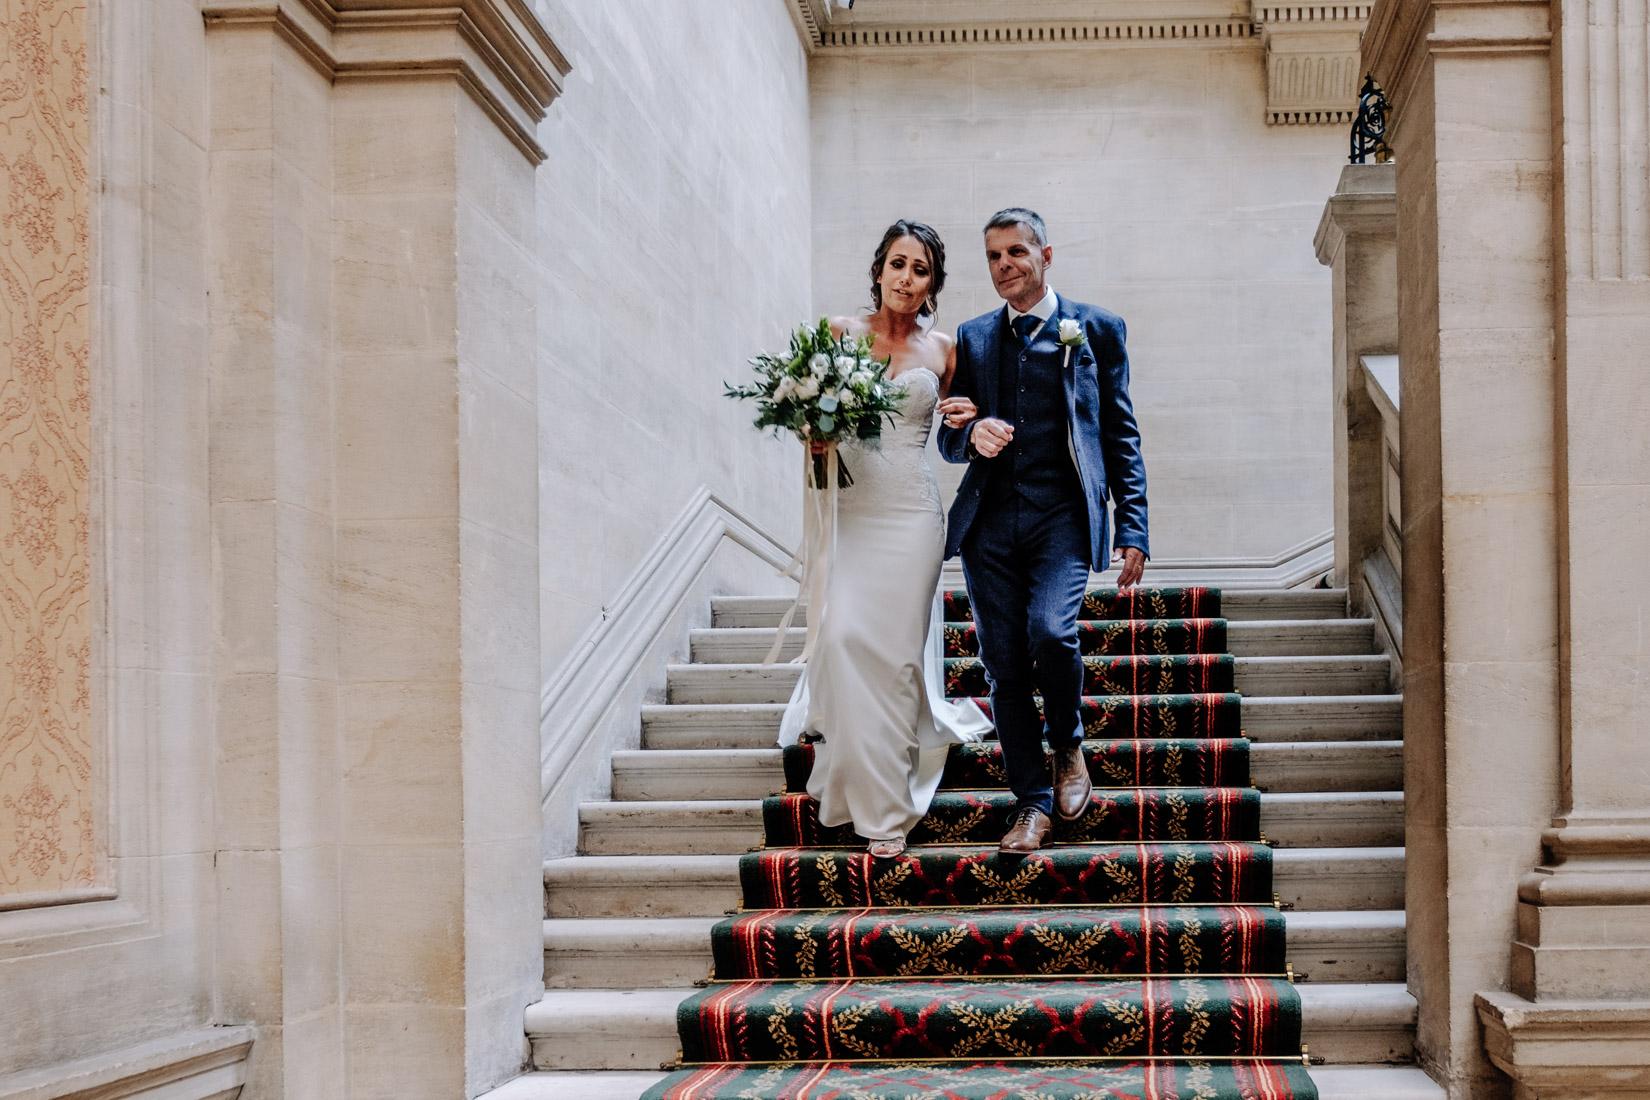 Heythrop Park wedding photography of Megan and Richard. Documentary style wedding photography by Sam and Steve Photography